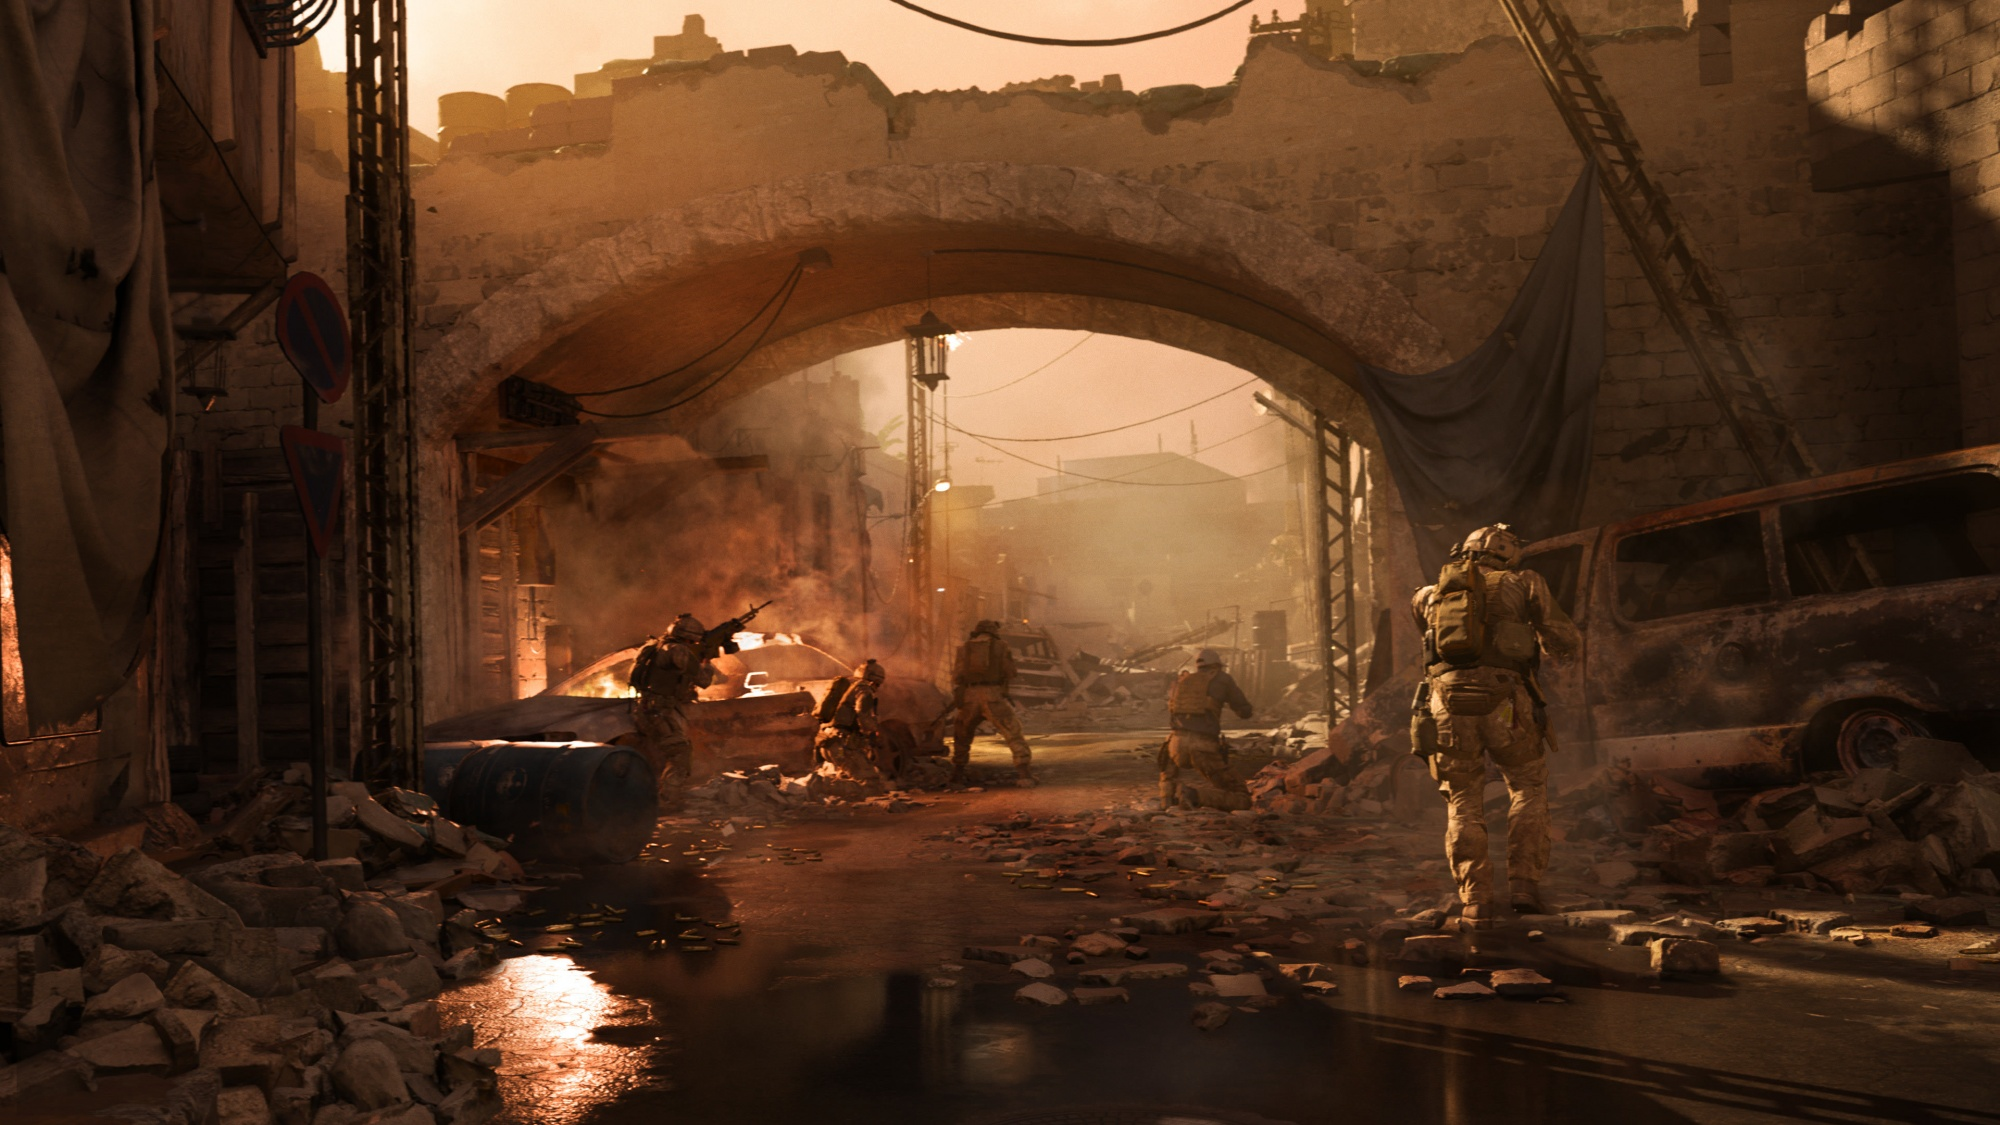 Mittelerde Karte 4k.Call Of Duty Modern Warfare Multiplayer Gameplay In 4k